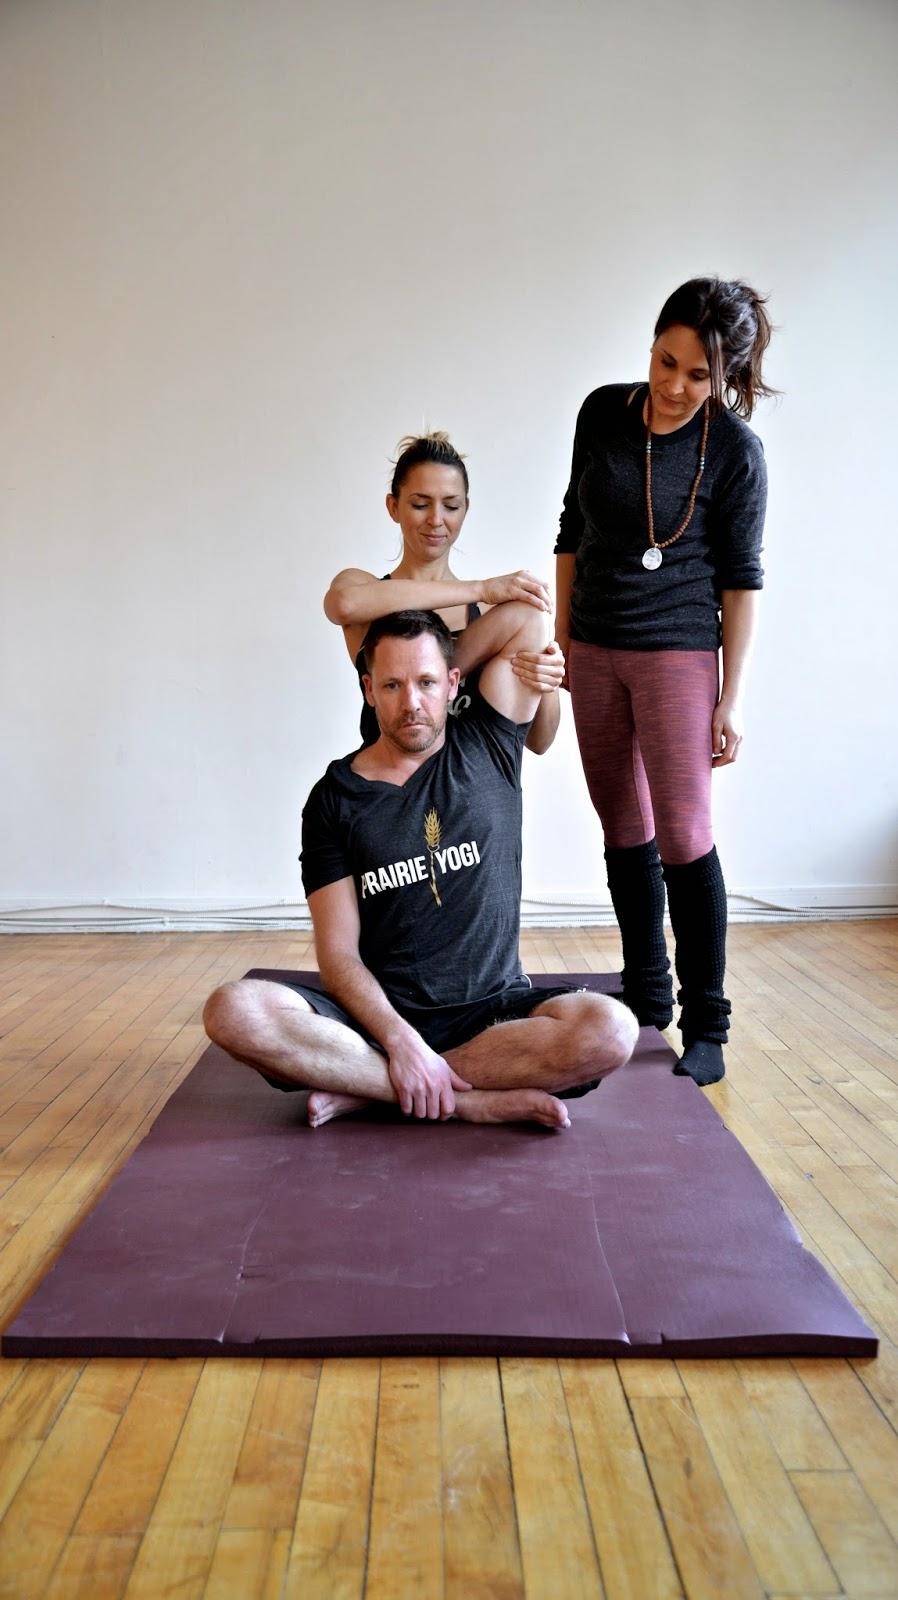 thai yoga massage, partner yoga winnipeg, healing hands, loving touch, winnipeg events, winnipeg yoga, monica angelatos, prairie yogi